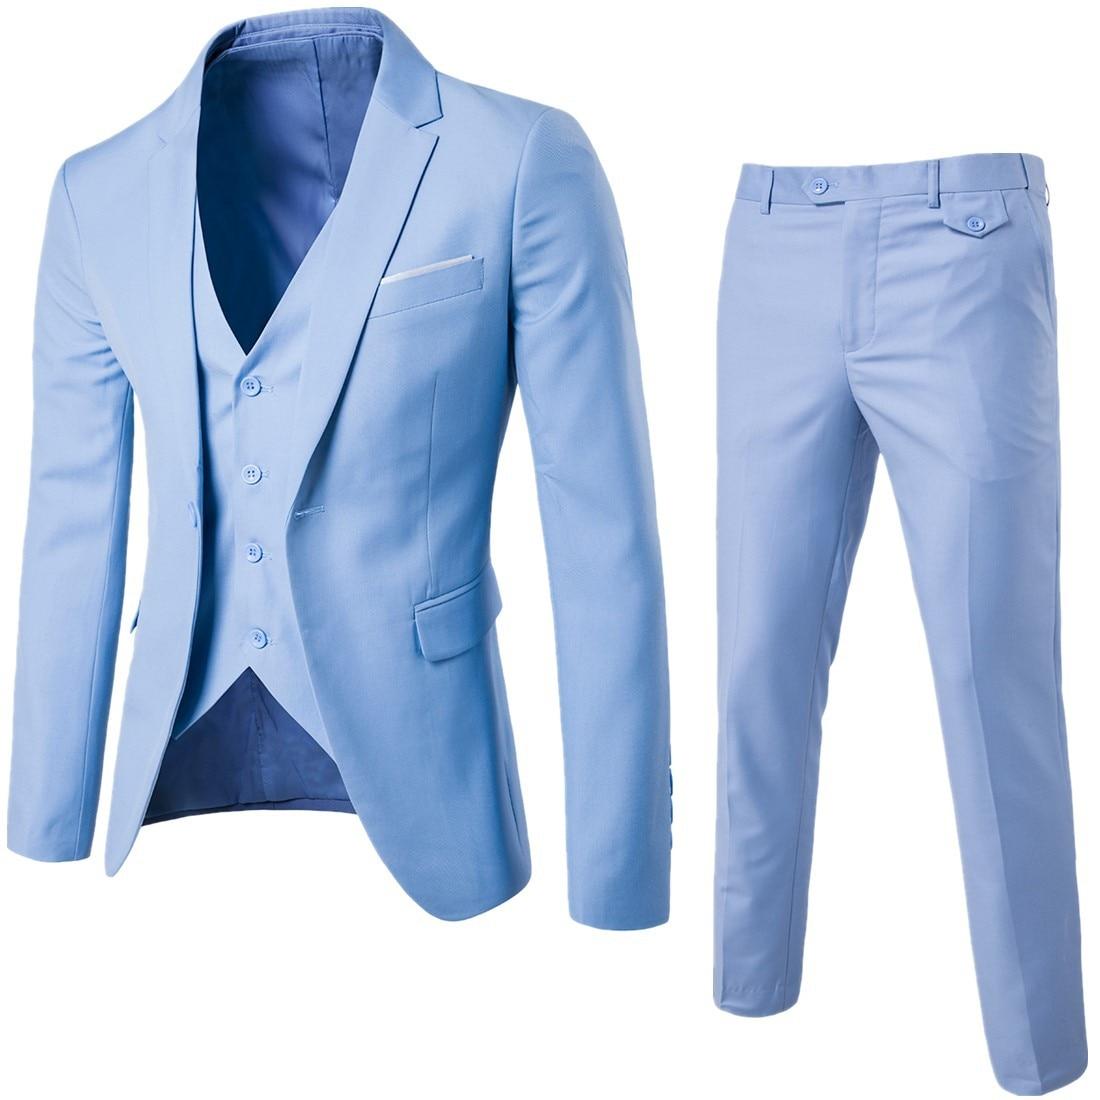 Suit Men Three-piece Set Slim Fit Business Formal Wear Business Suit Best Man Service Korean-style Groom Marriage Formal Dress